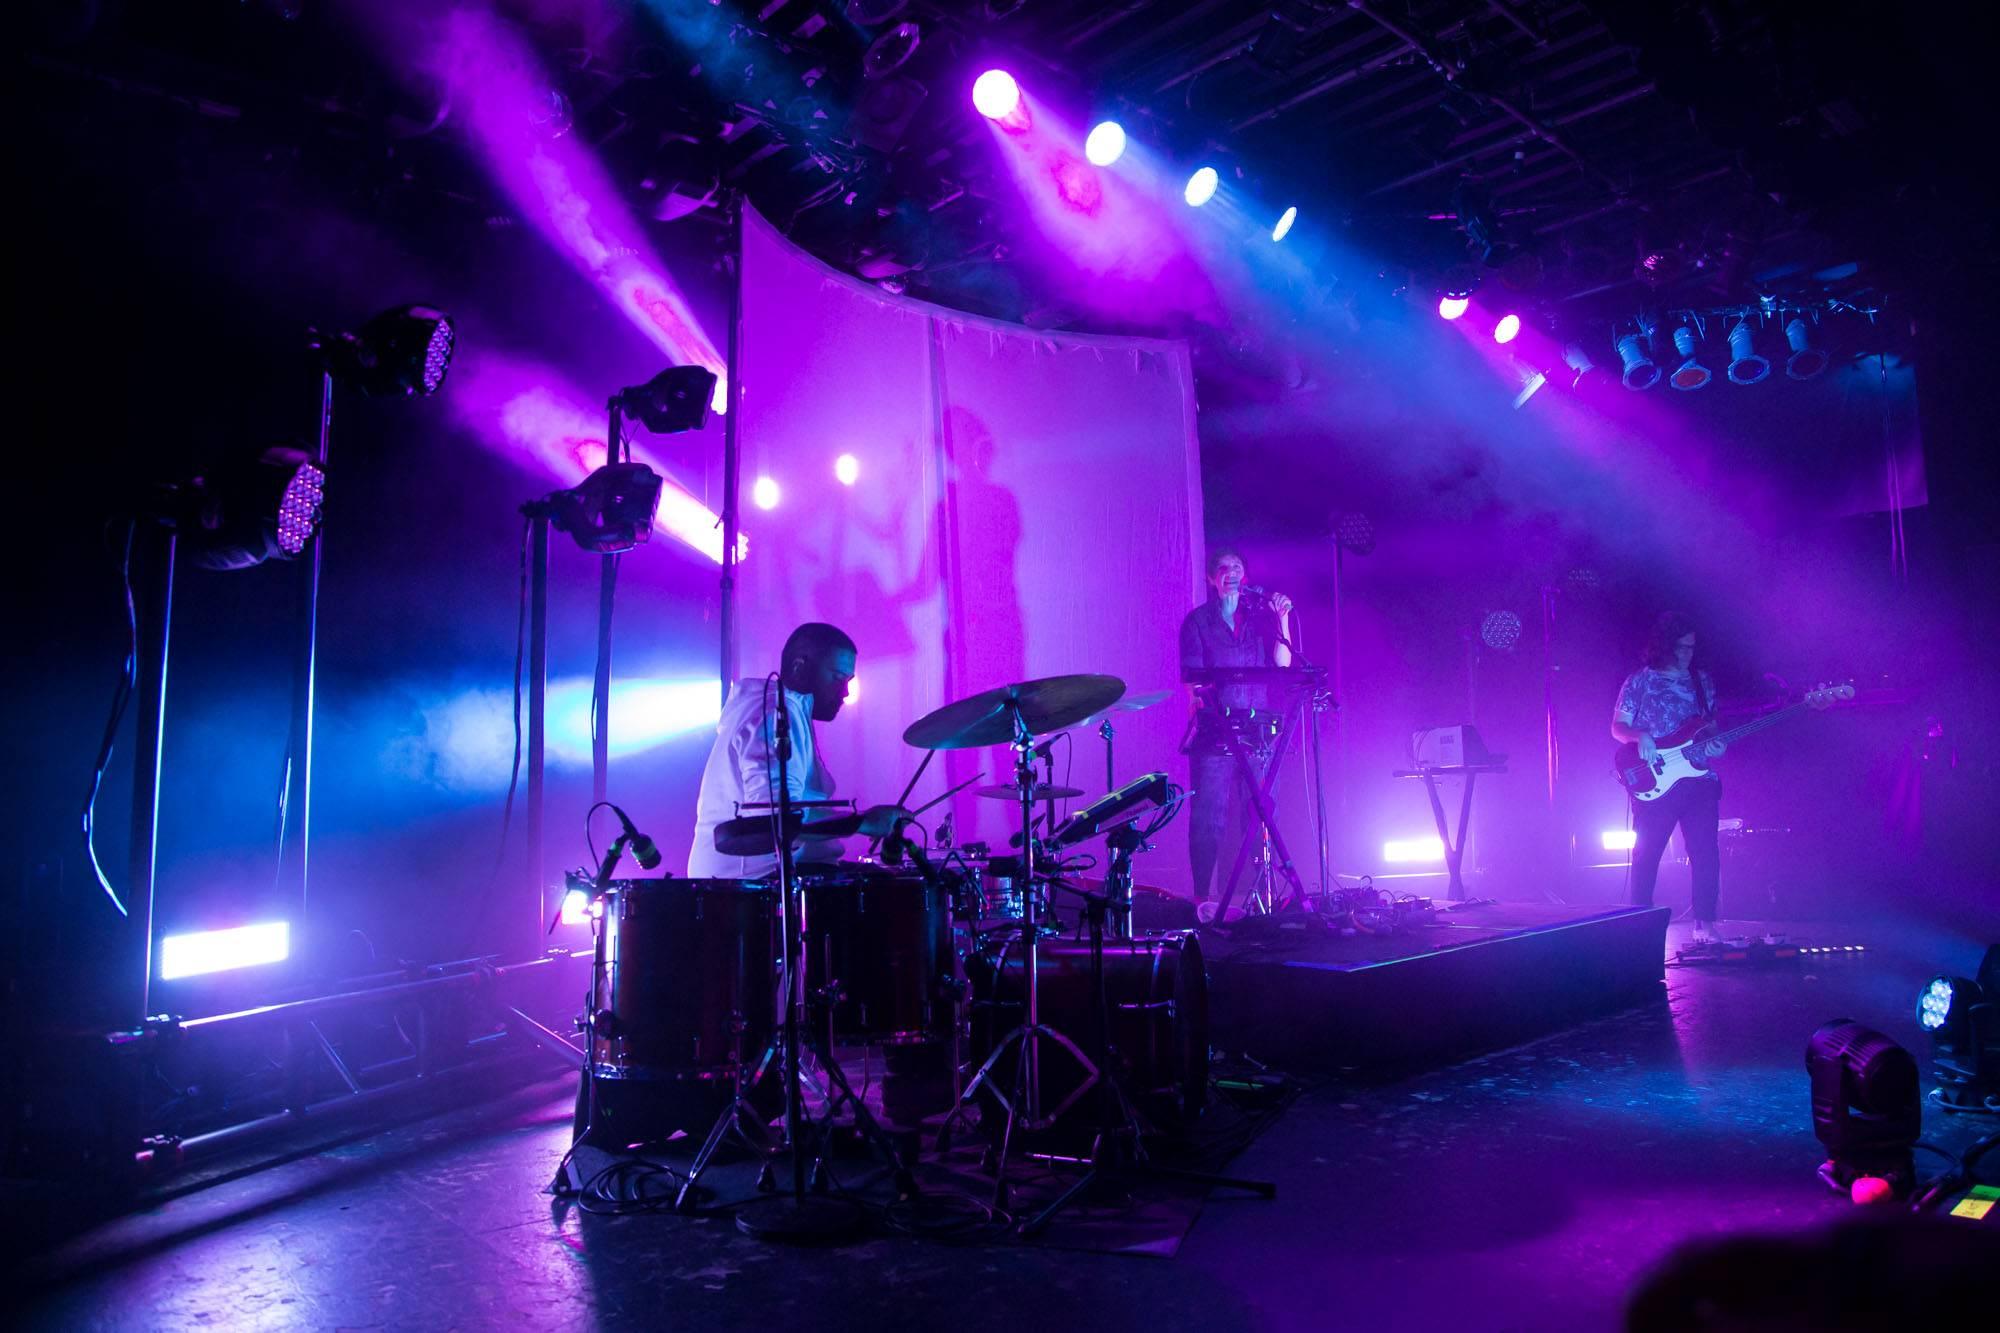 Tune-Yards at the Commodore Ballroom, Vancouver, Feb 27 2018. Kirk Chantraine photo.